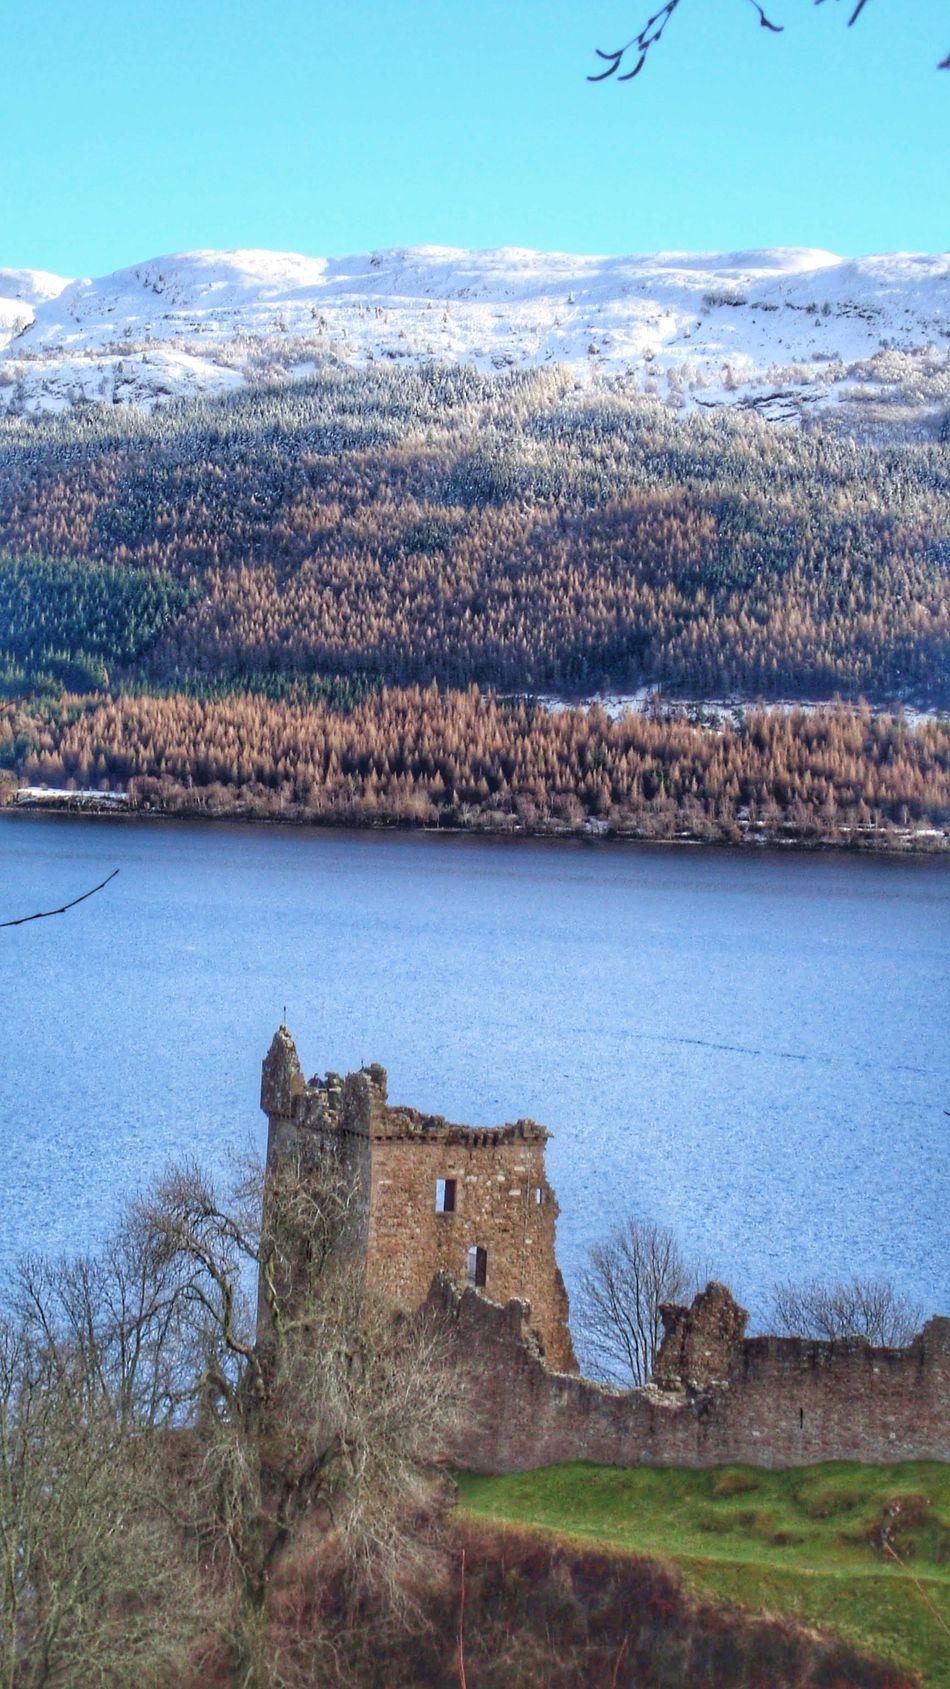 Urquhart Castle Ruins UrquhartCastle Urquhart Castle Ruins Castle Scotland Snow Lake Blue Sky Loch Ness Loch